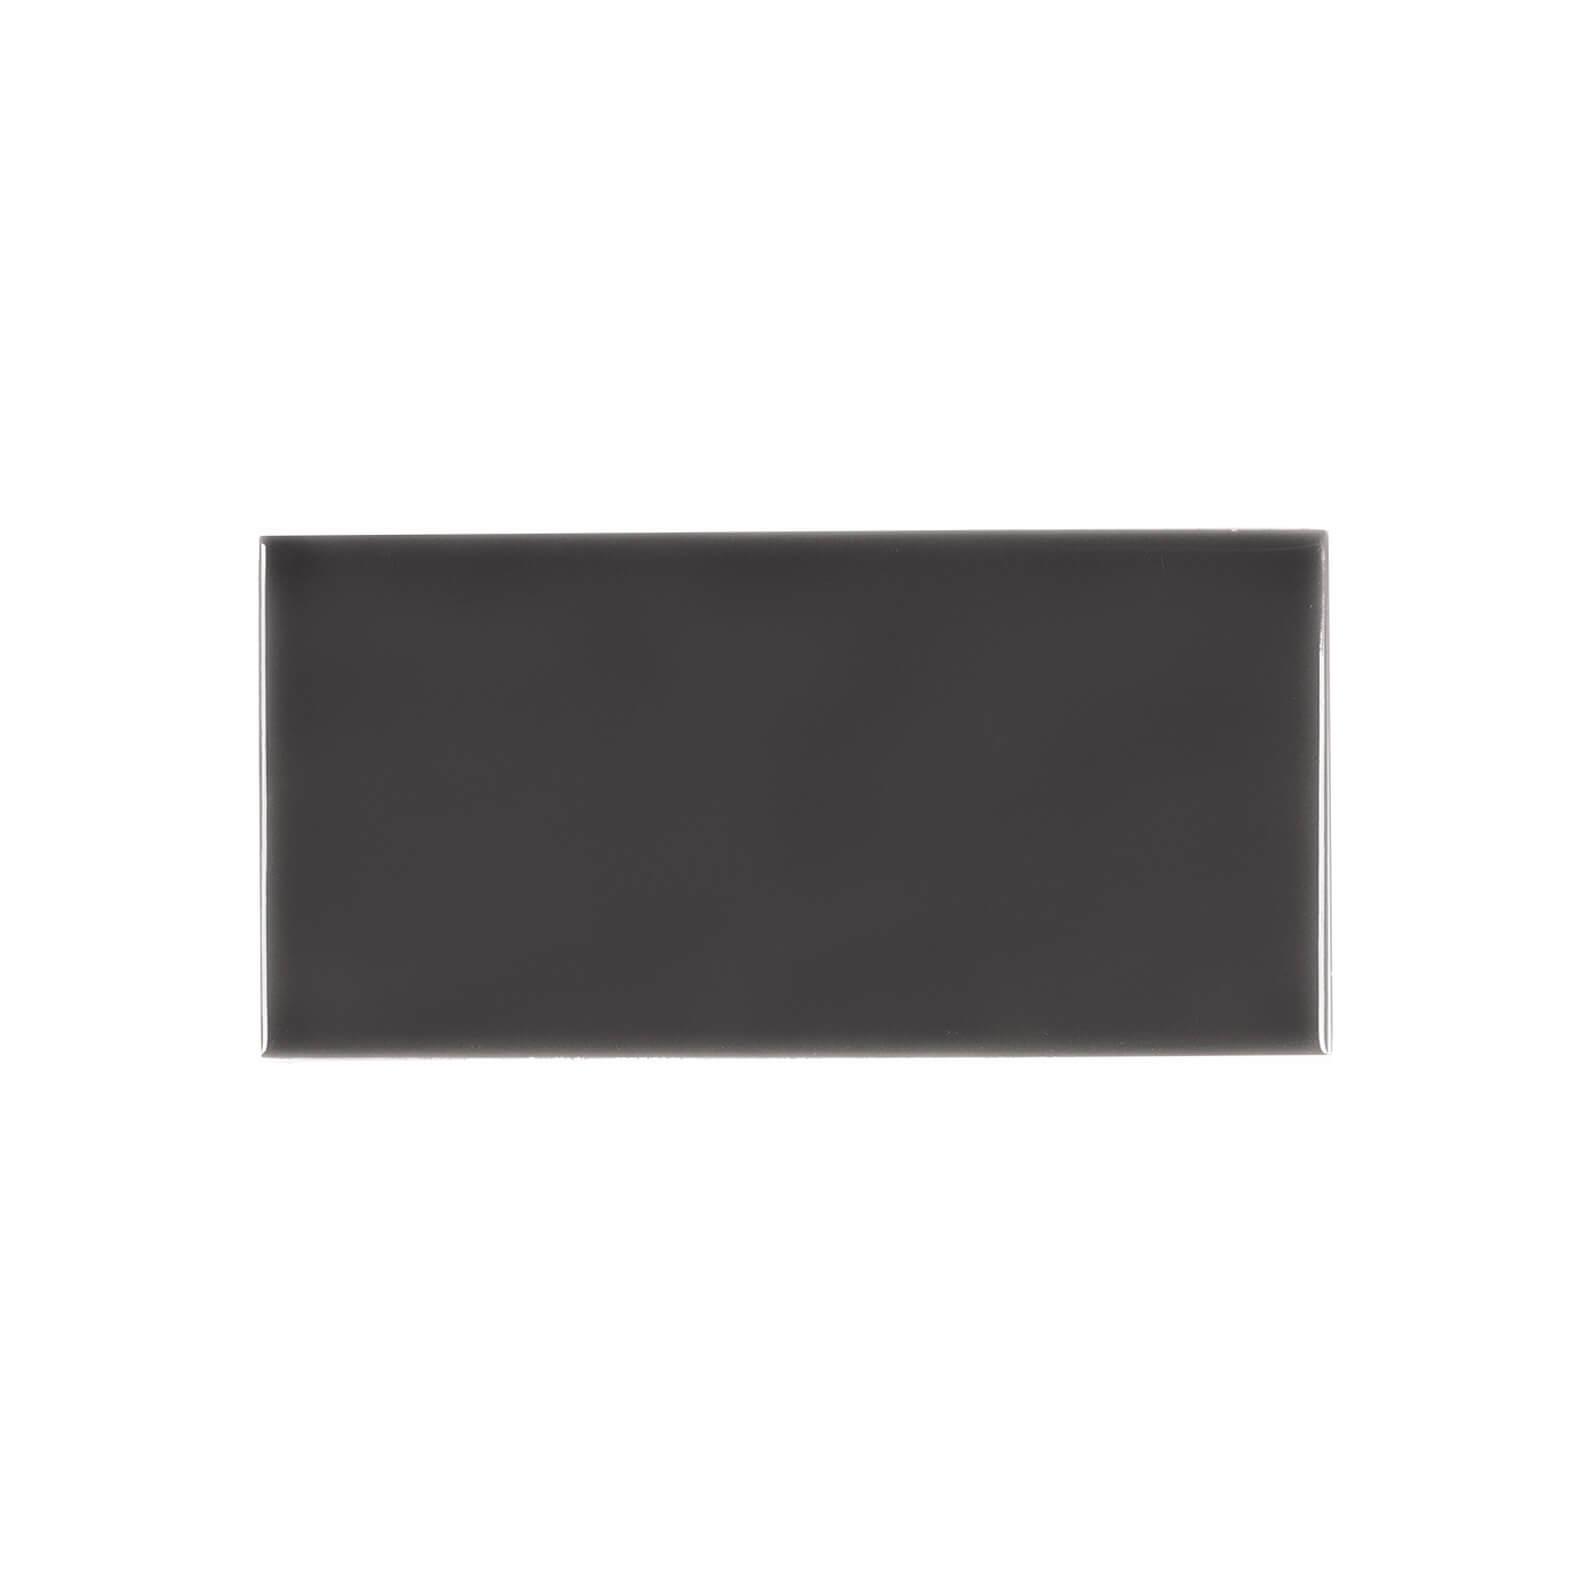 ADST1015 - LISO  - 7.3 cm X 14.8 cm